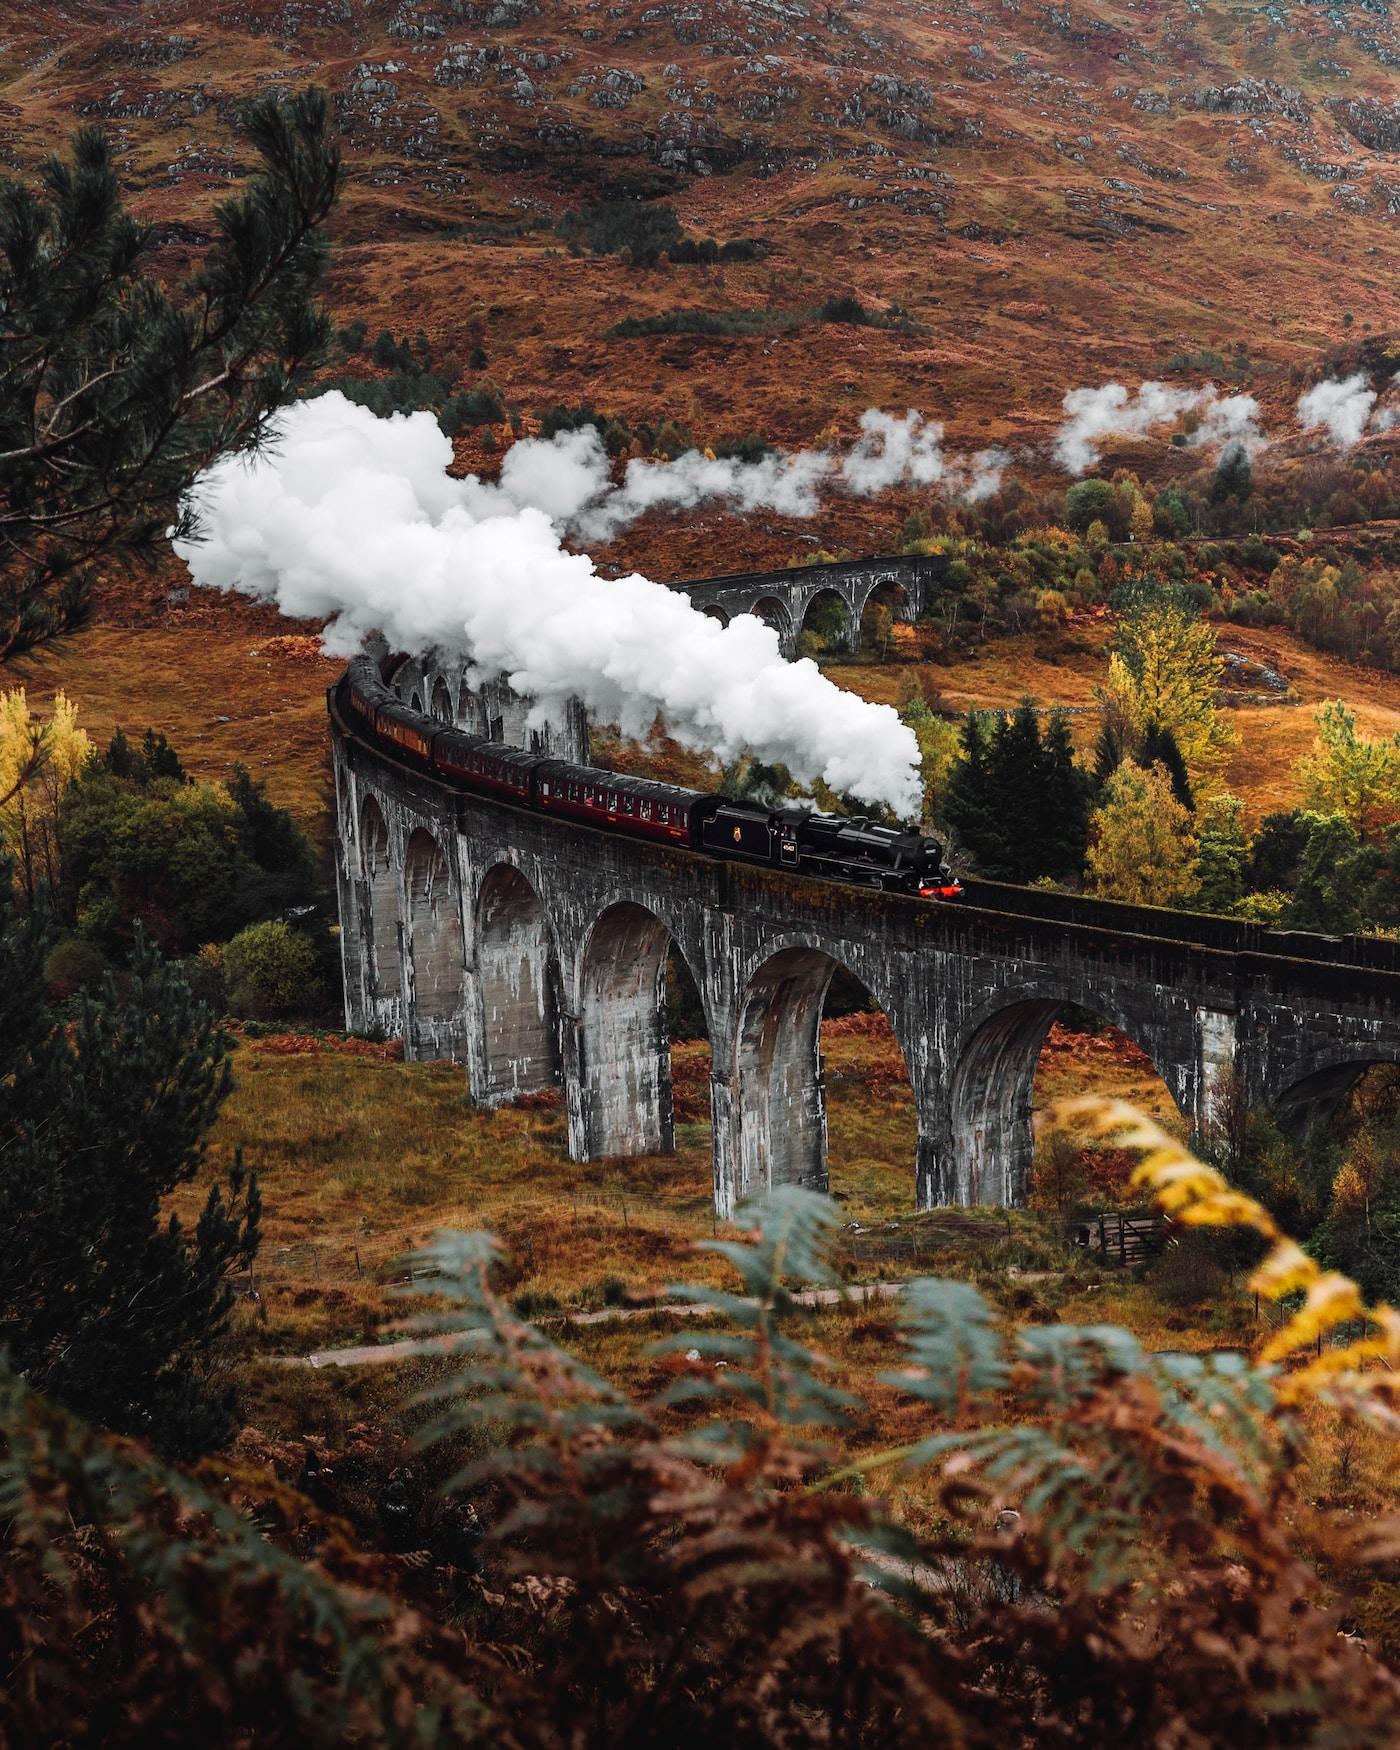 Vision Scotland. aerial photo of black train during daytime